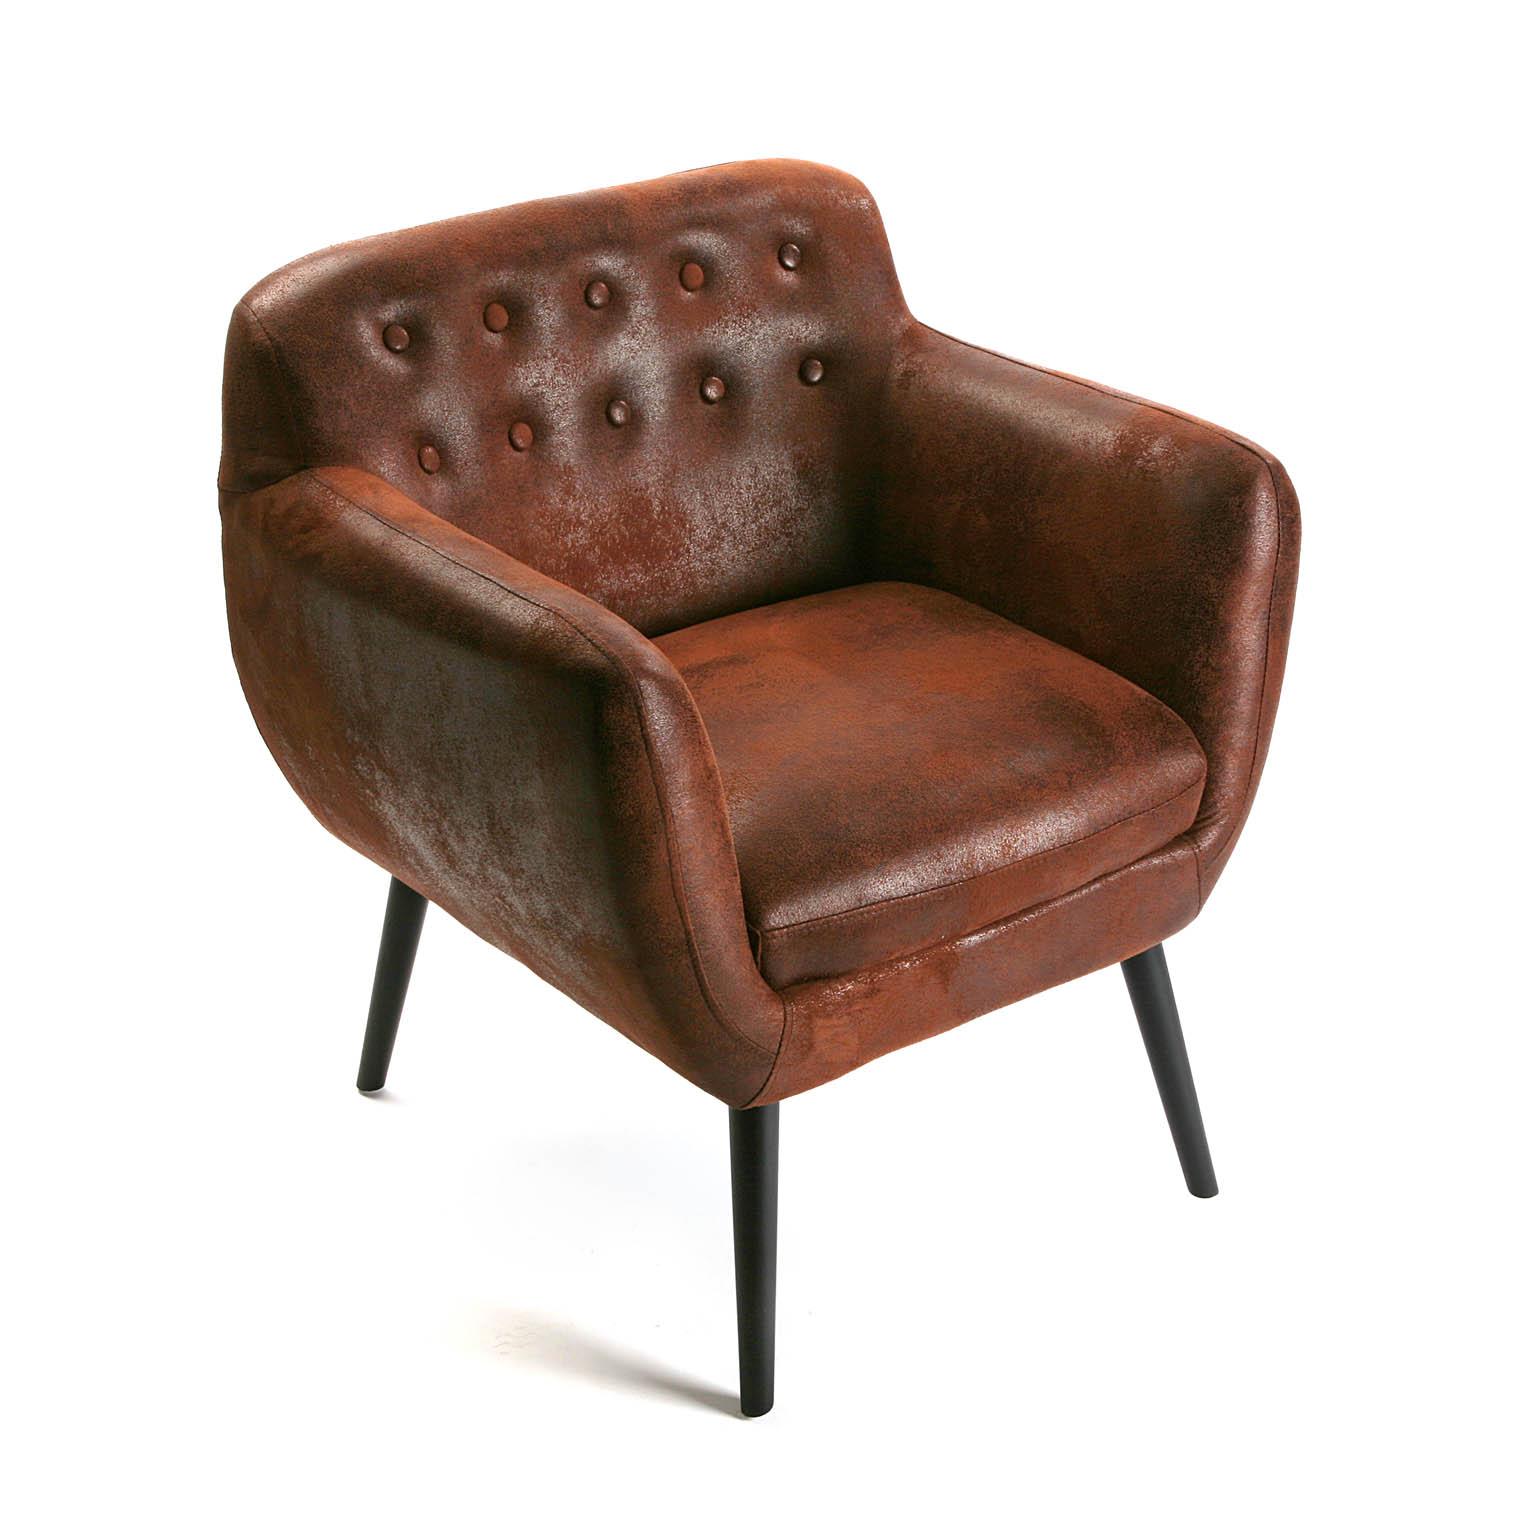 fauteuil club en tissu facon simili marron vieilli capitonne 68x63x76 vancouver